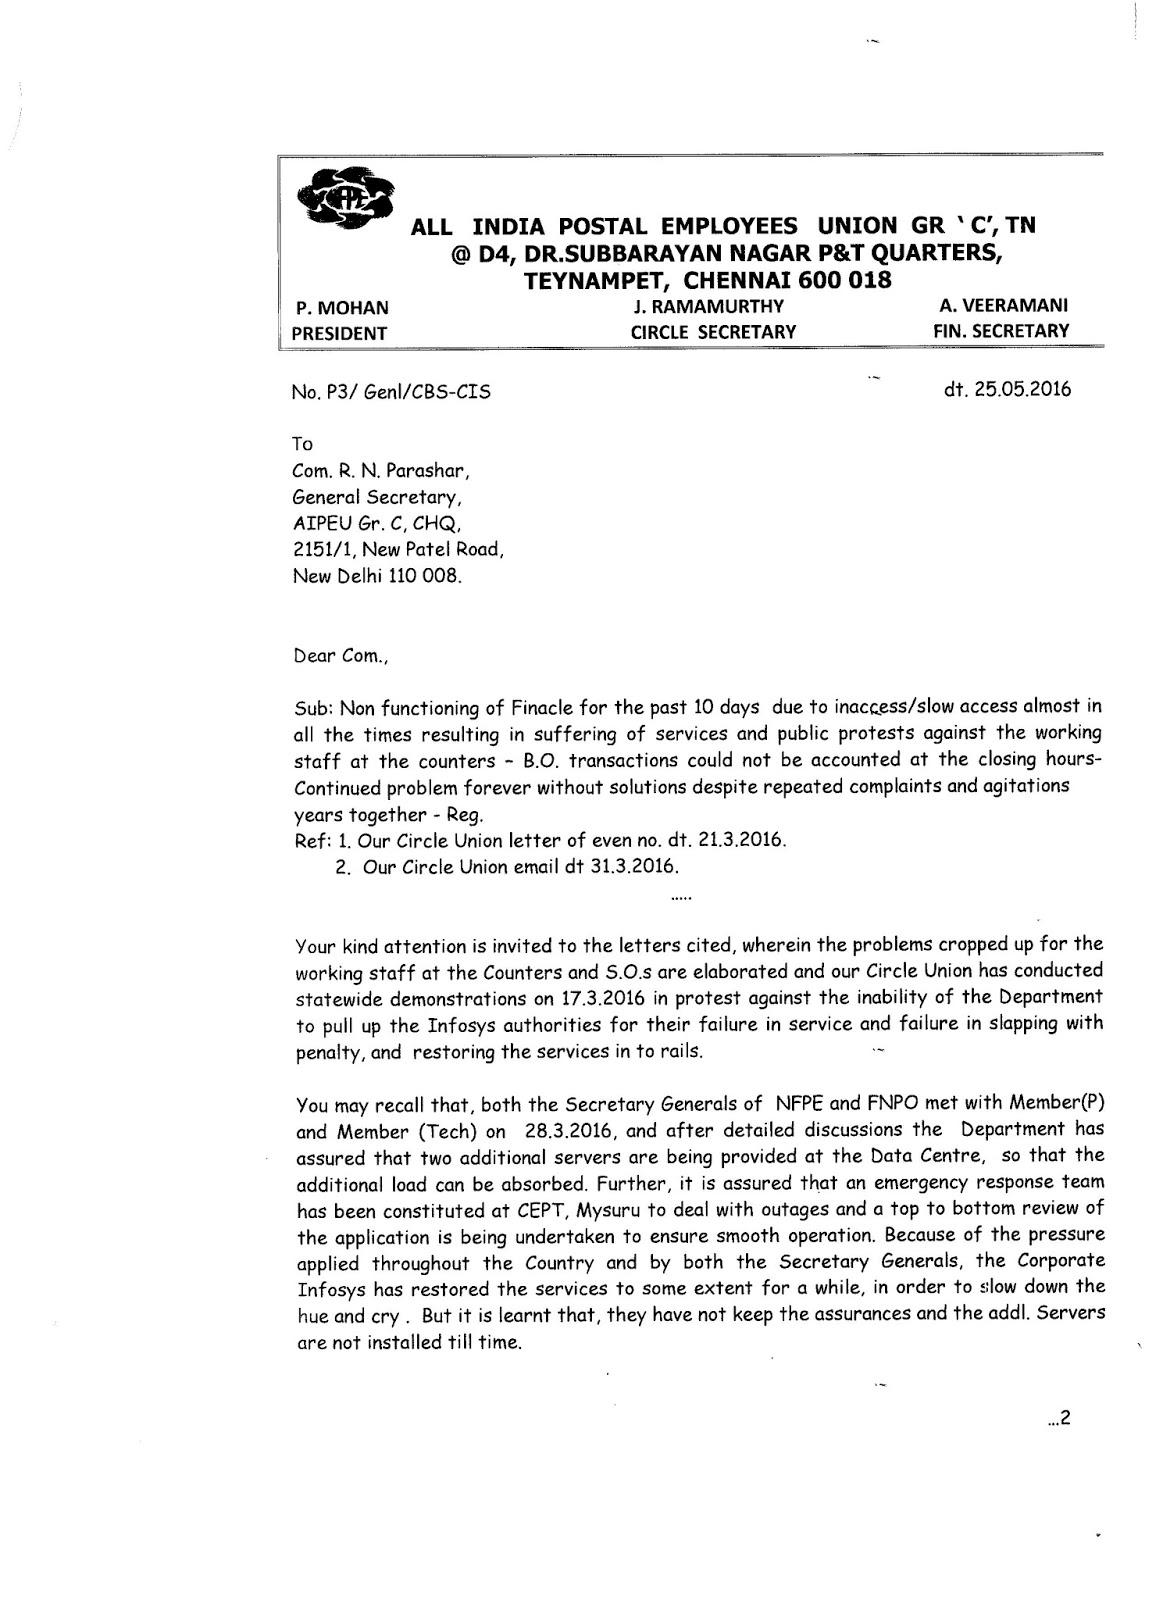 Request letter sle for transportation allowance 28 images request letter sle for transportation allowance request letter for accommodation and transport allowance all india association spiritdancerdesigns Choice Image